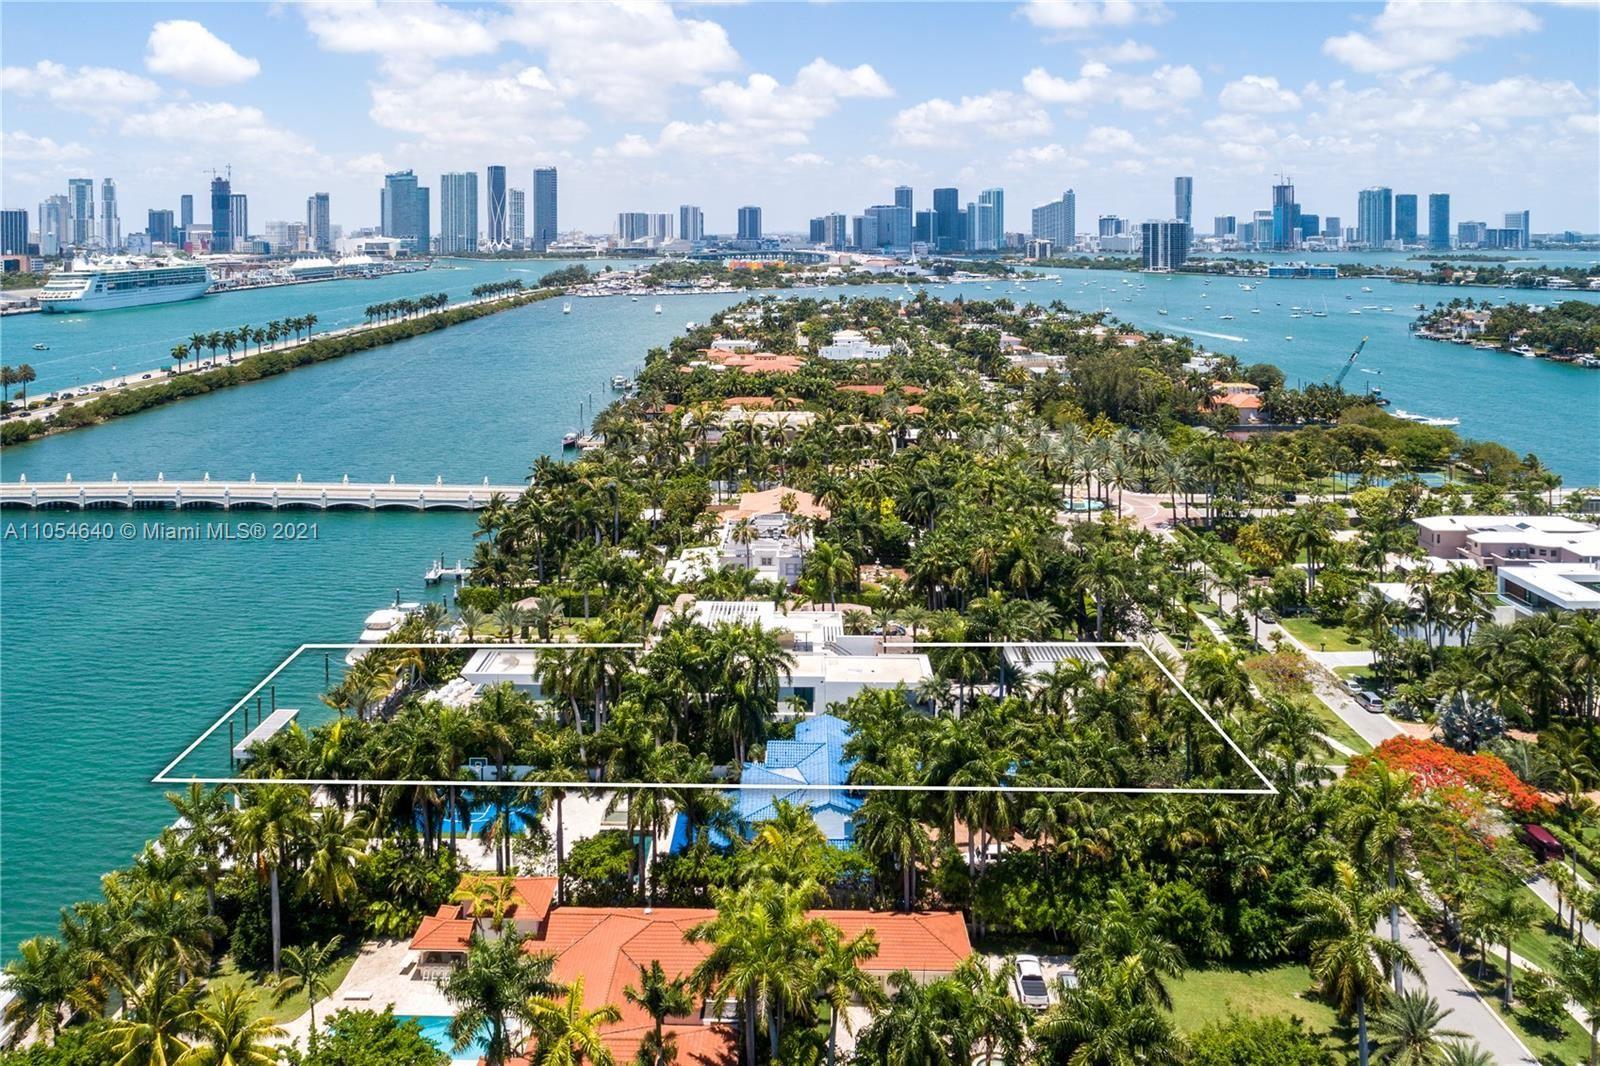 Photo of 130 Palm Ave, Miami Beach, FL 33139 (MLS # A11054640)